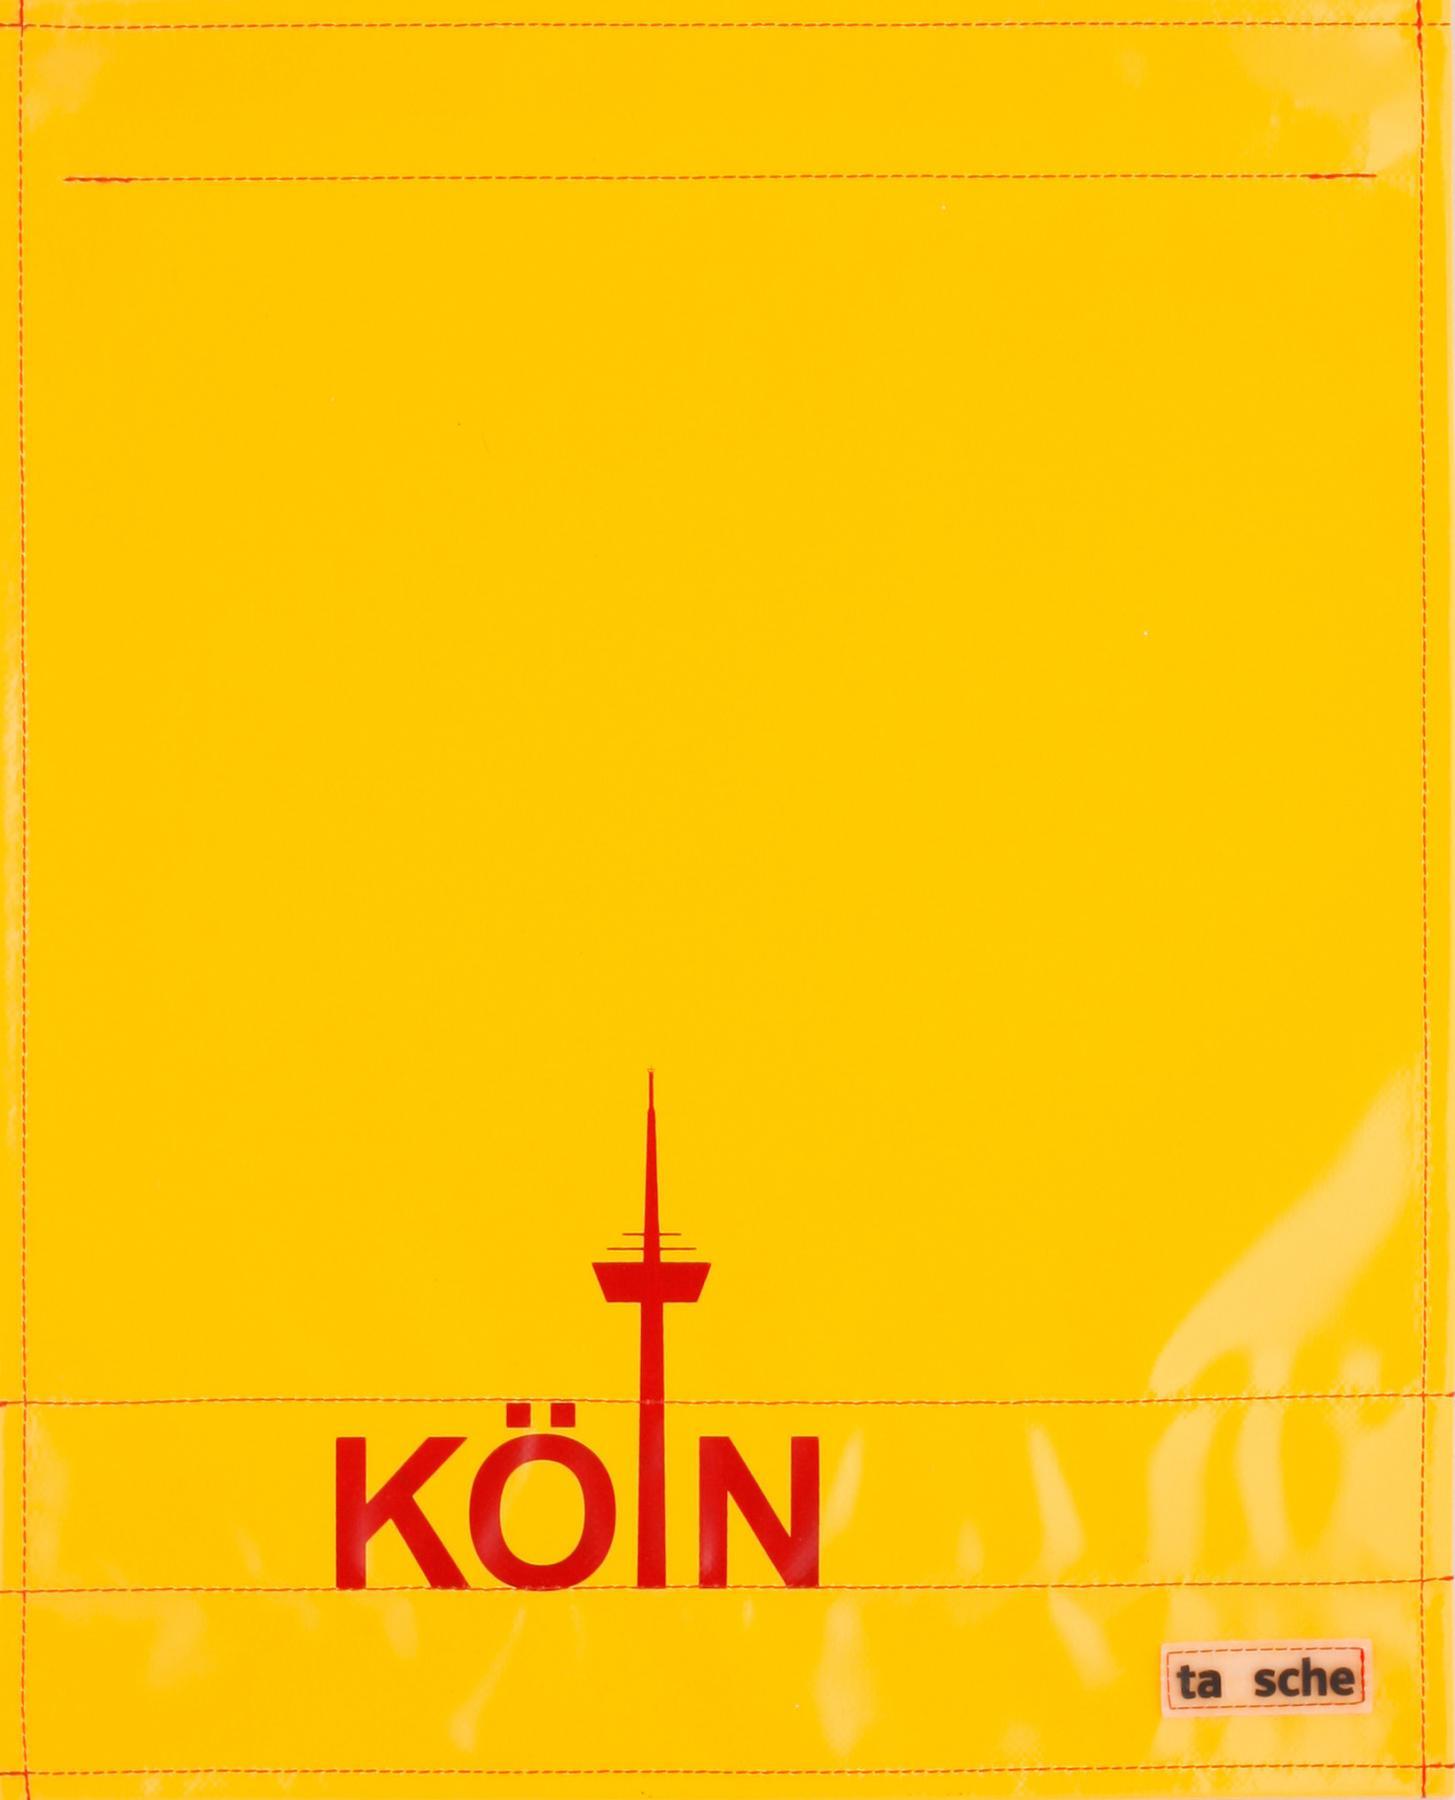 Köln gelb/rot (groß)